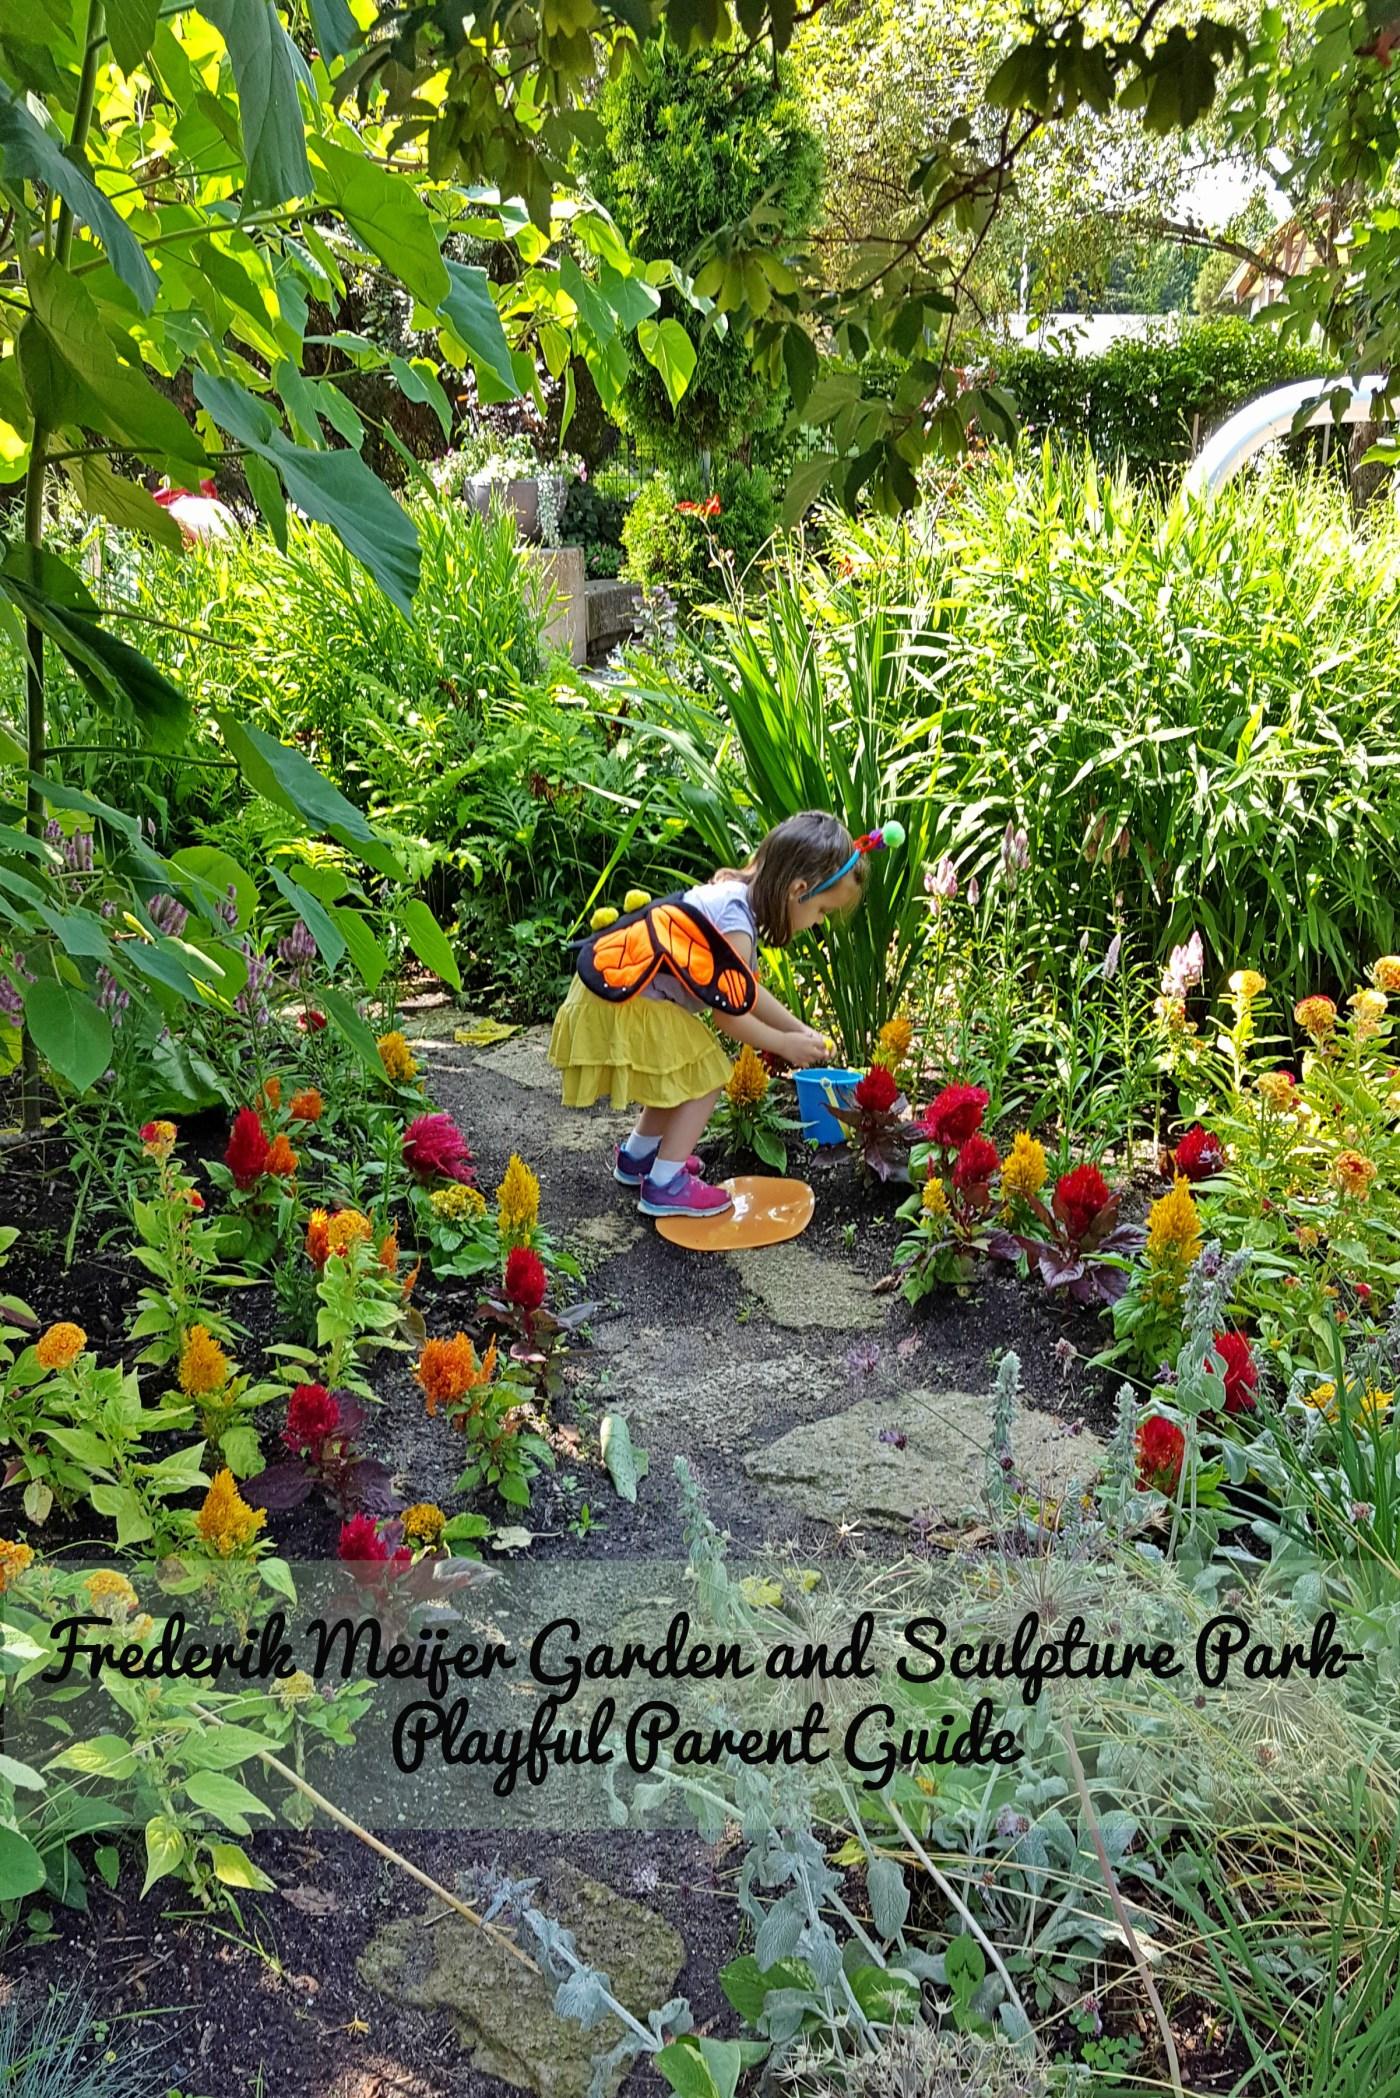 frederik meijer gardens and sculpture park playful parent guide - Frederik Meijer Garden